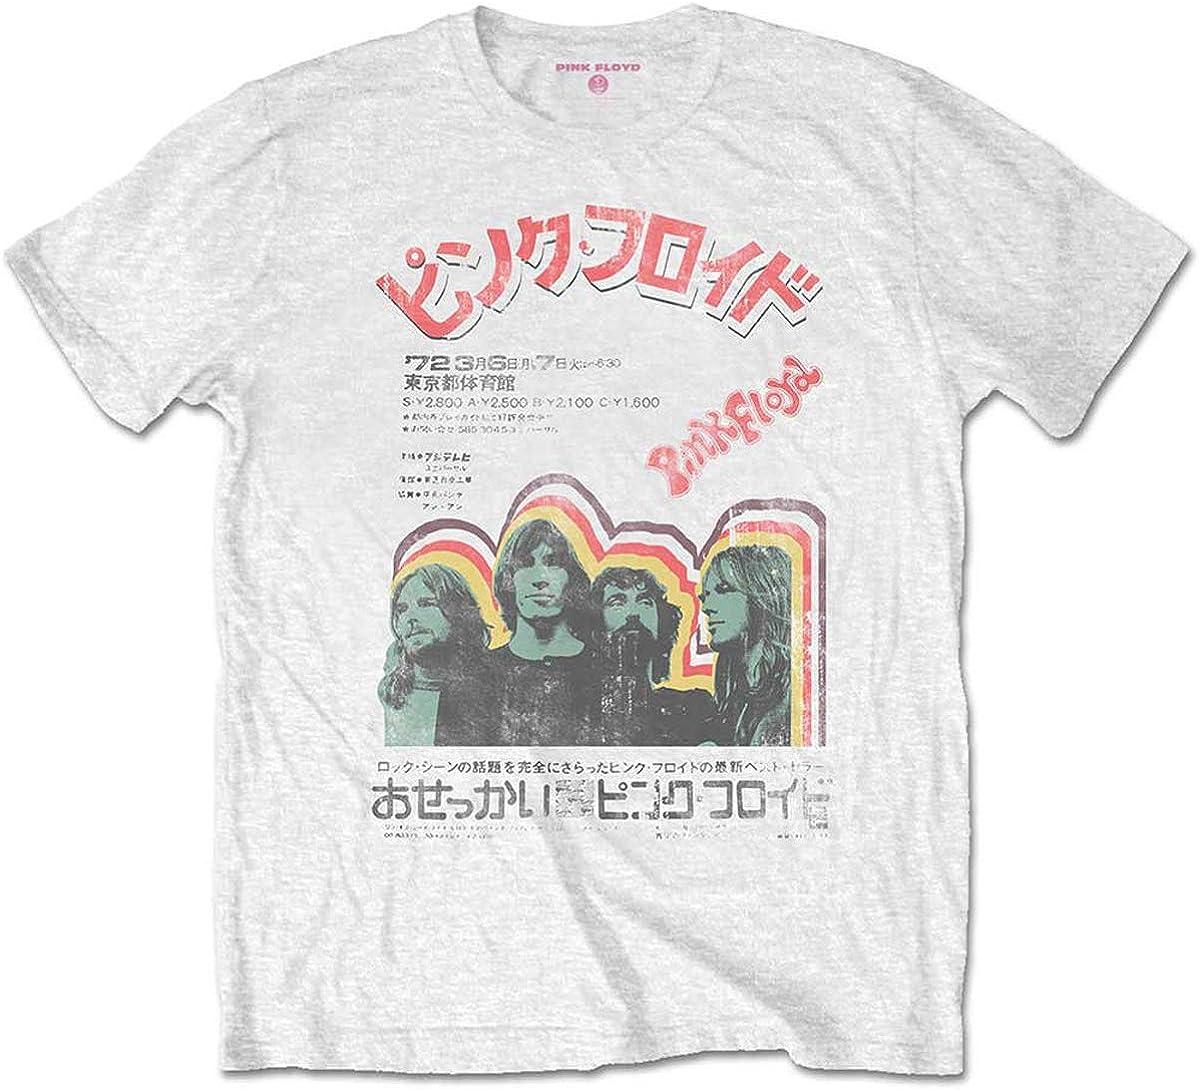 Fuel Band Alternative Rock Band T-shirt Cotton 100/% Brand New